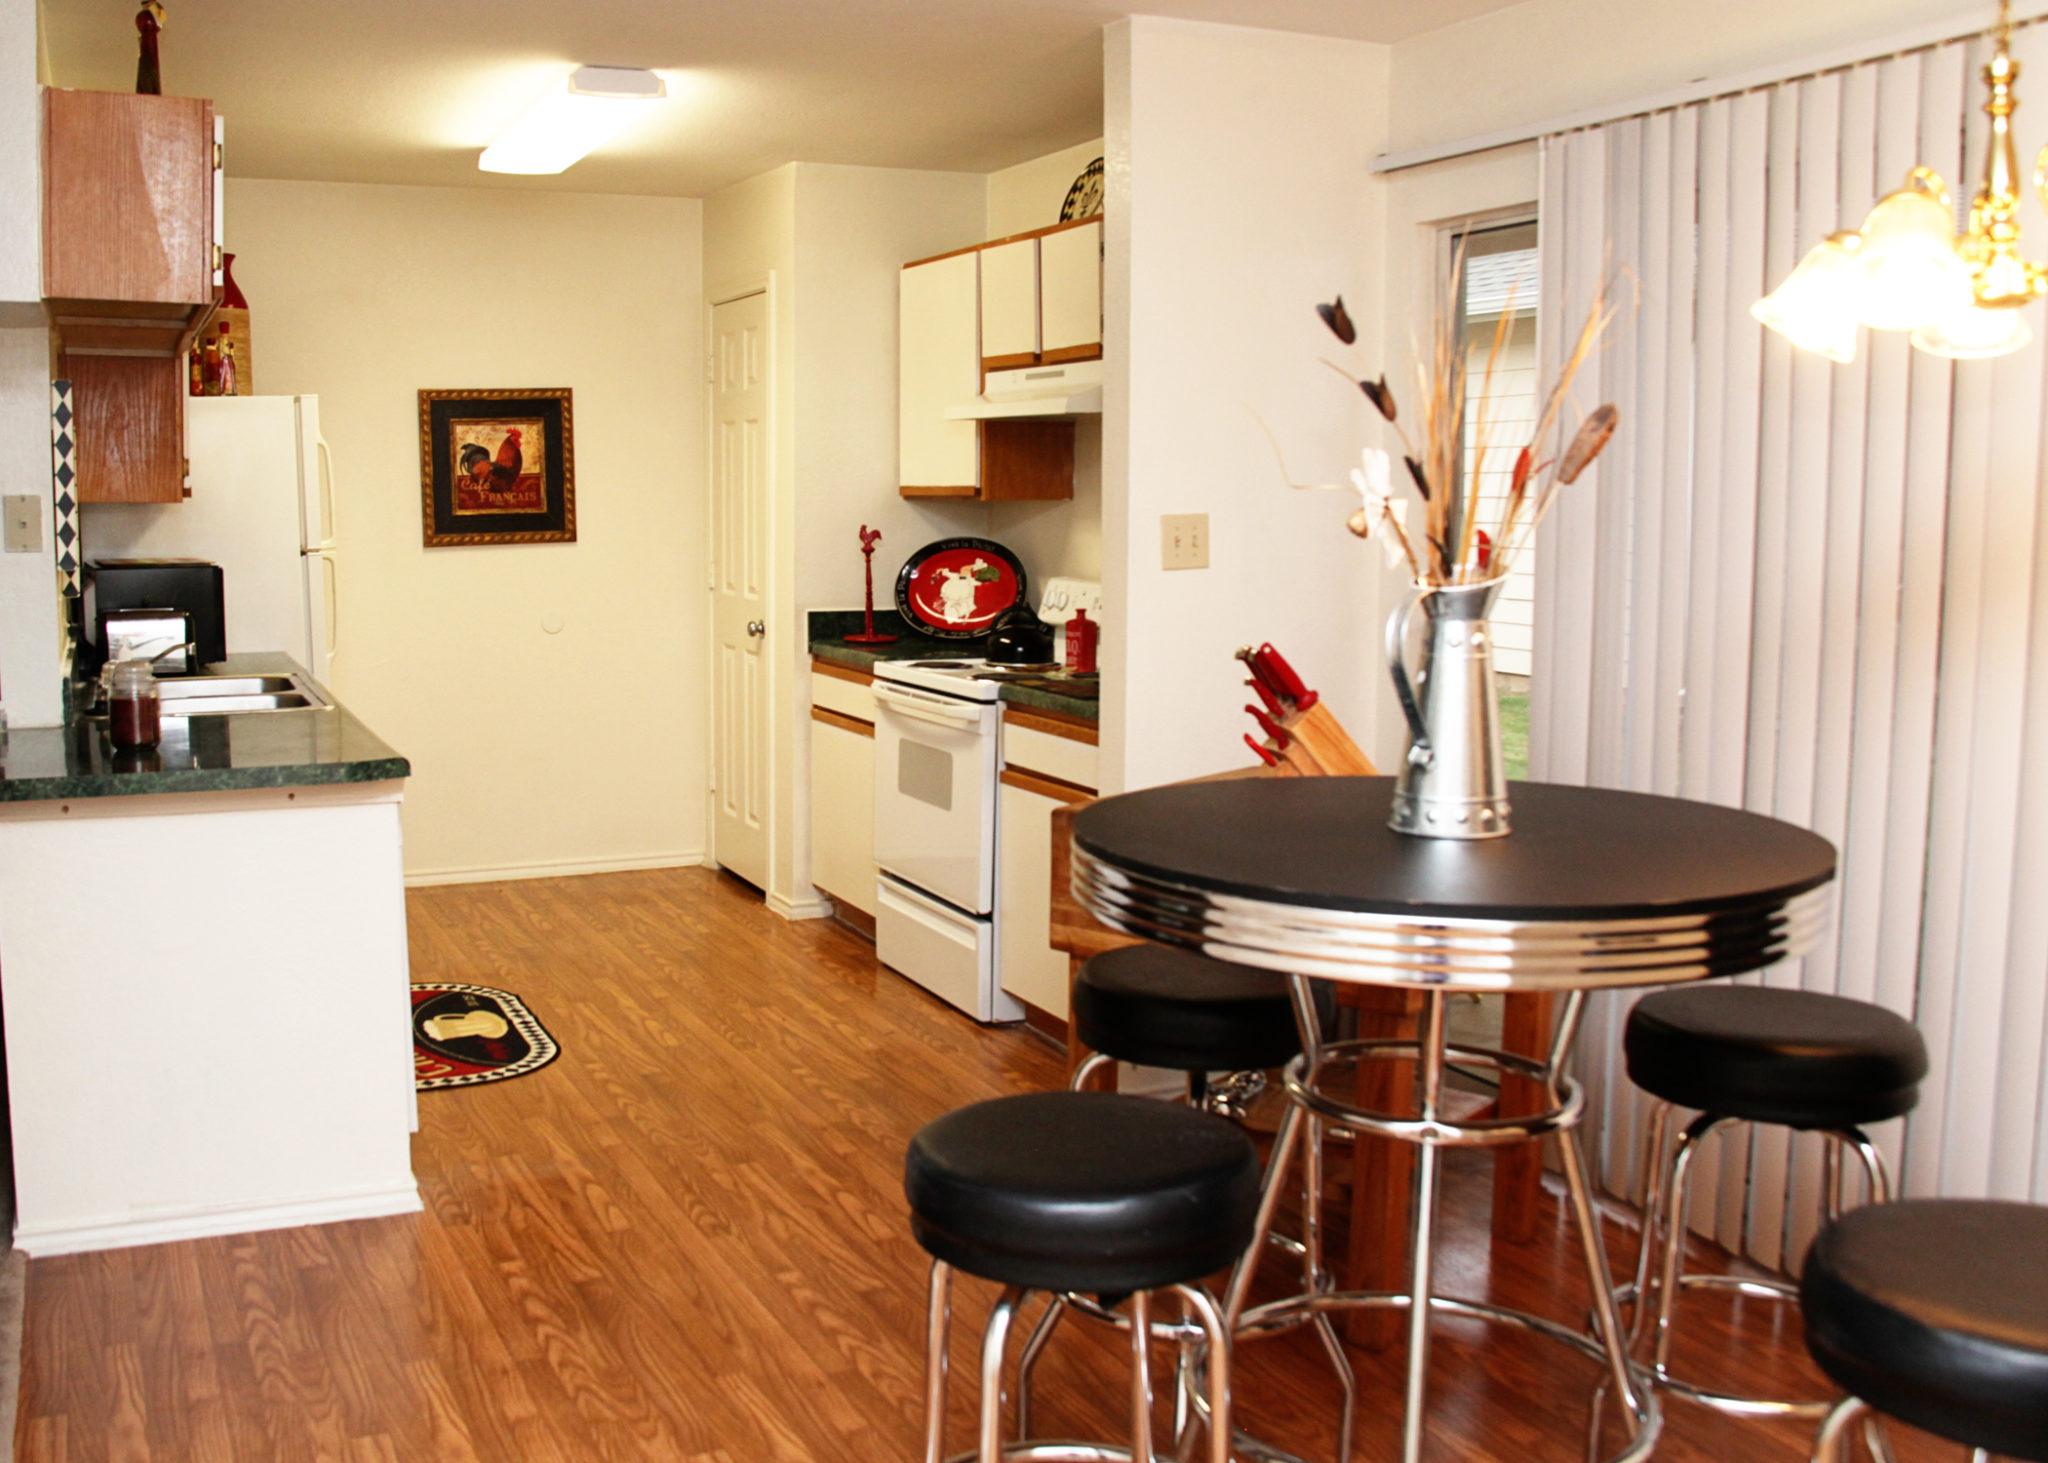 Ridgeview Townhomes, Paris, TX, Apt. Dining Room, Kitchen1